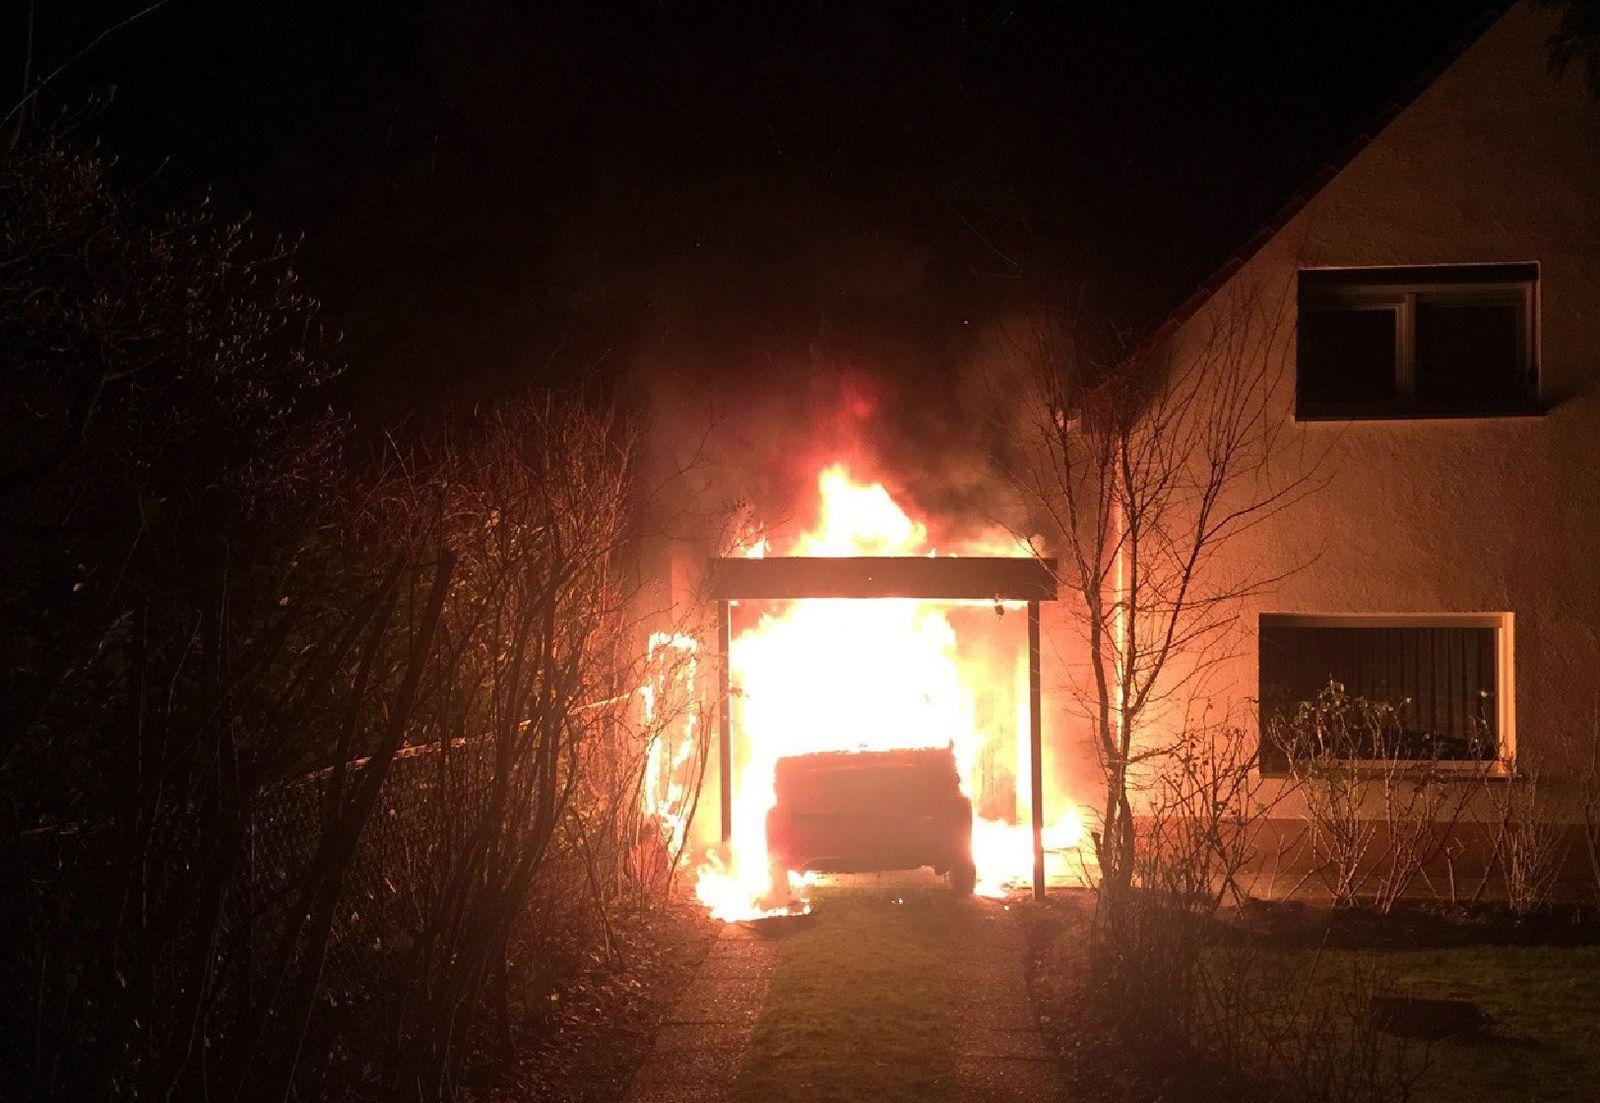 Brandanschläge auf Autos in Berlin-Neukölln